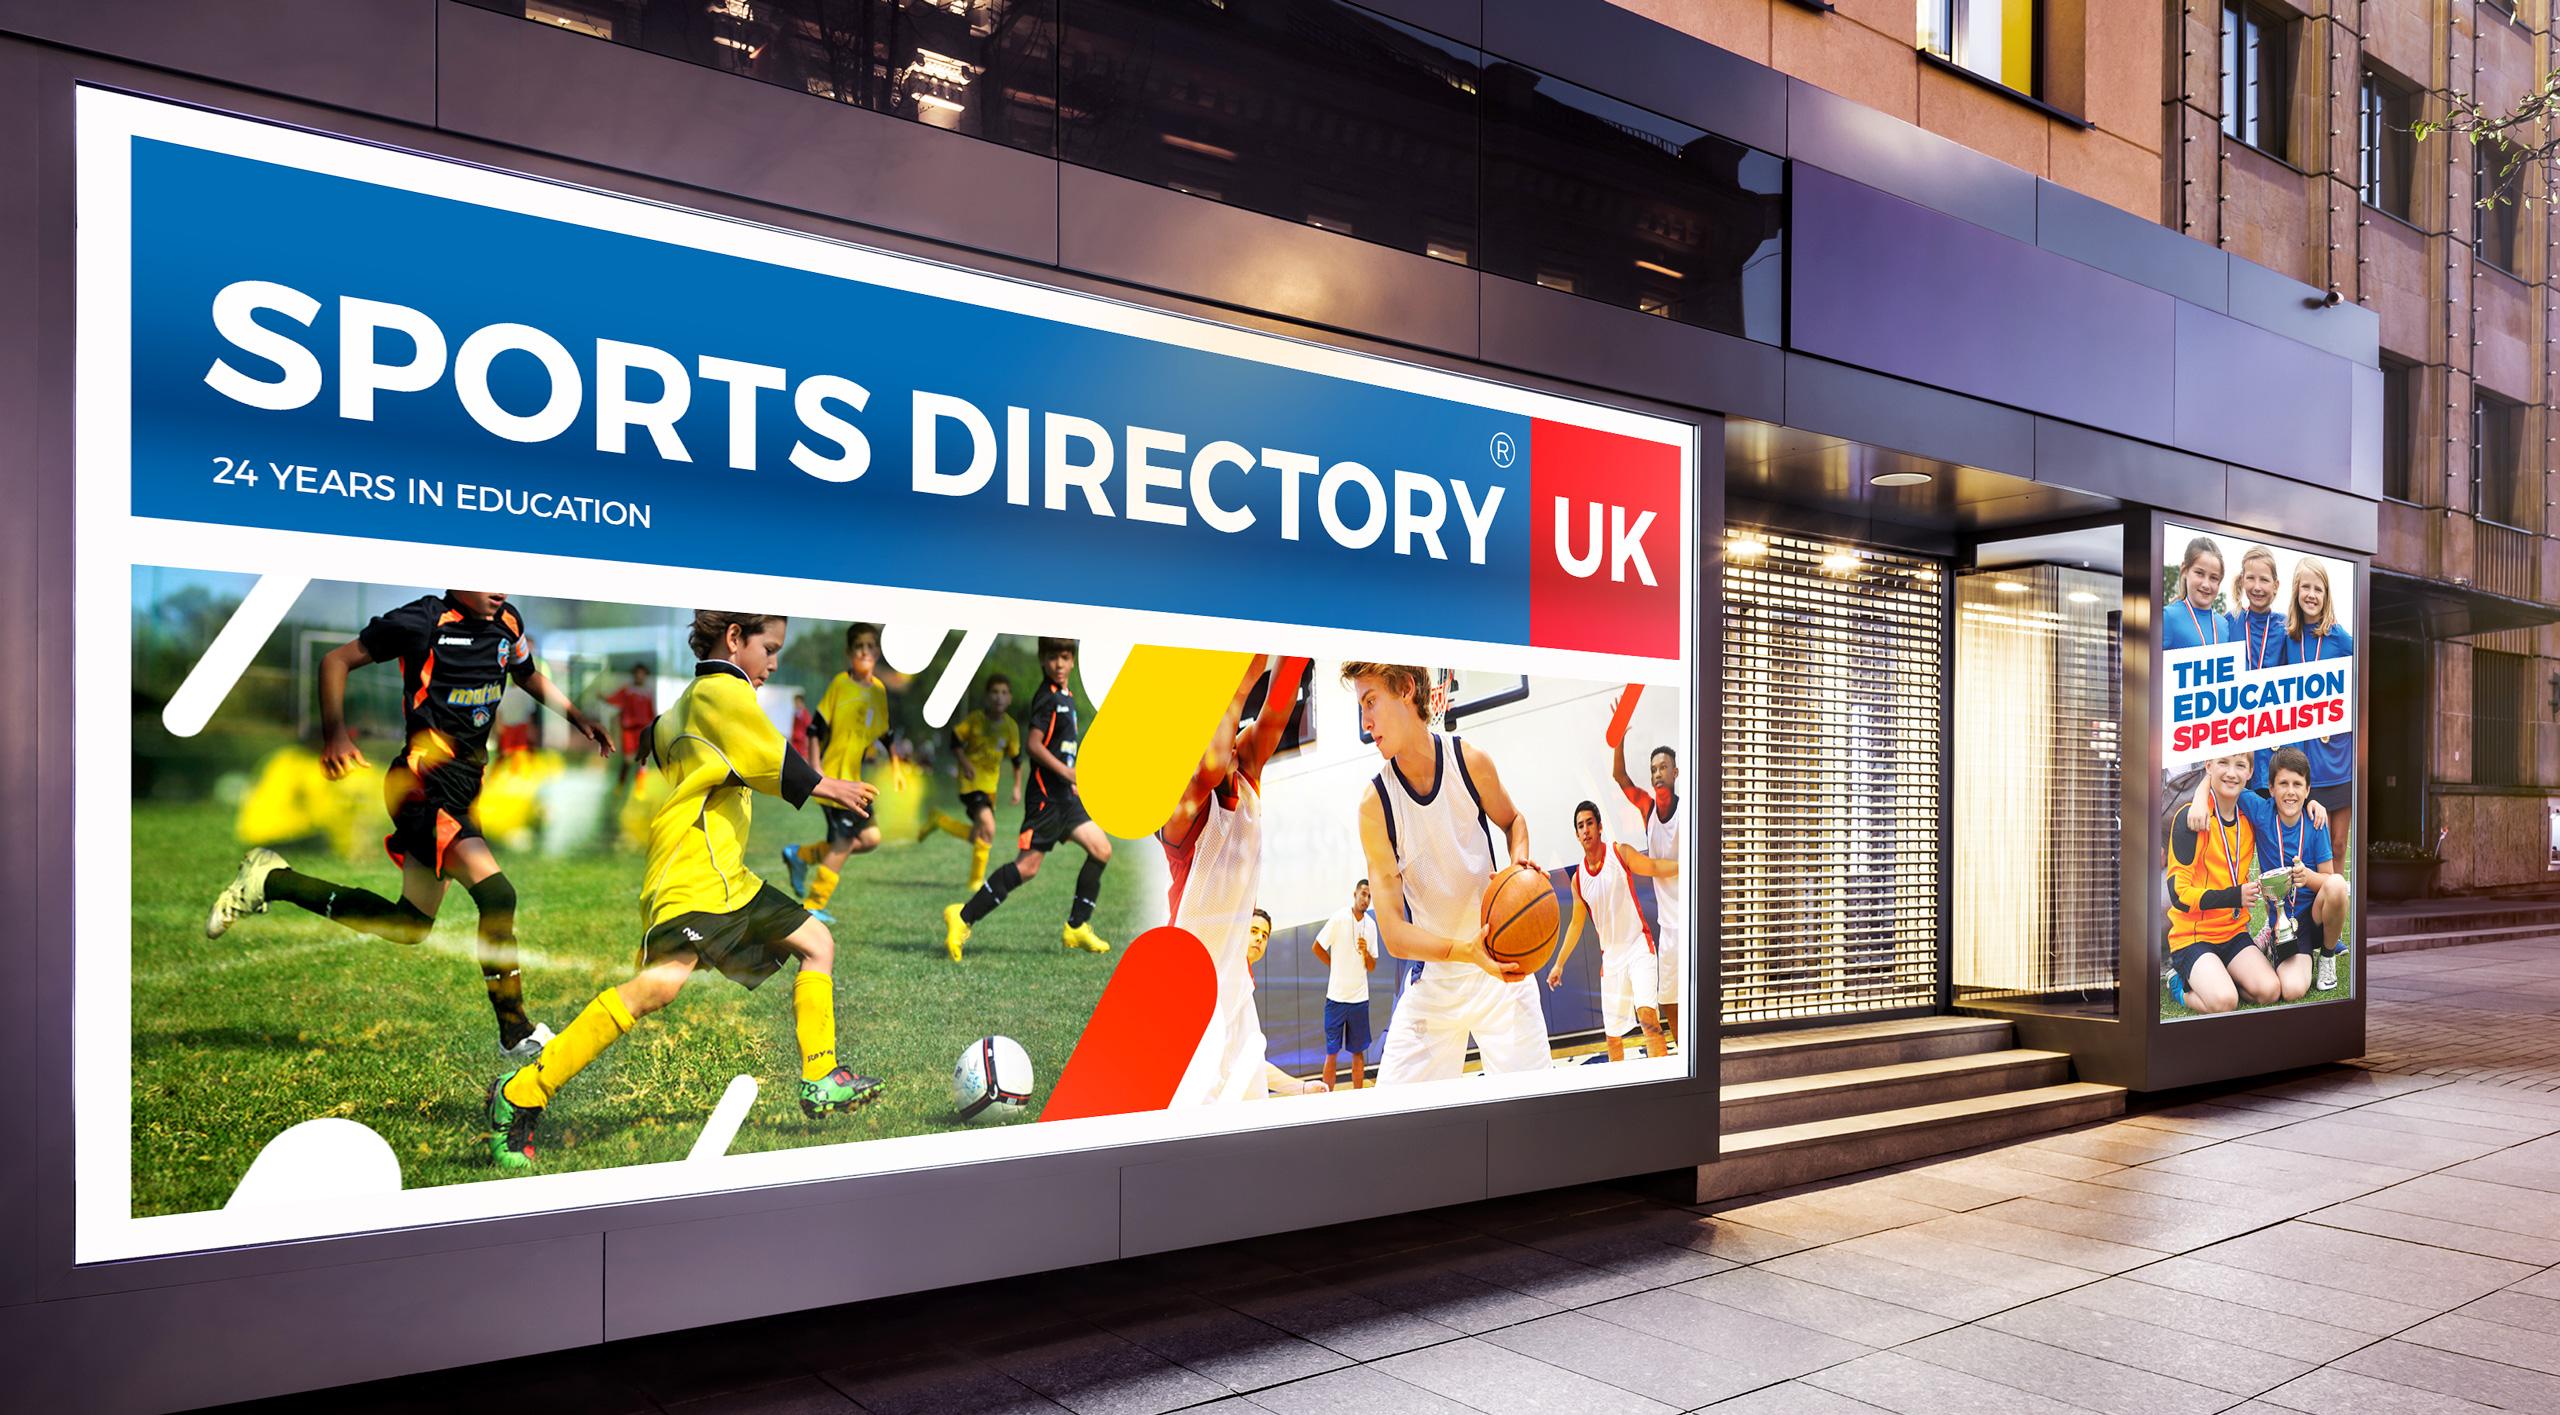 sports-directory-visual-identity-2-logobou.jpg